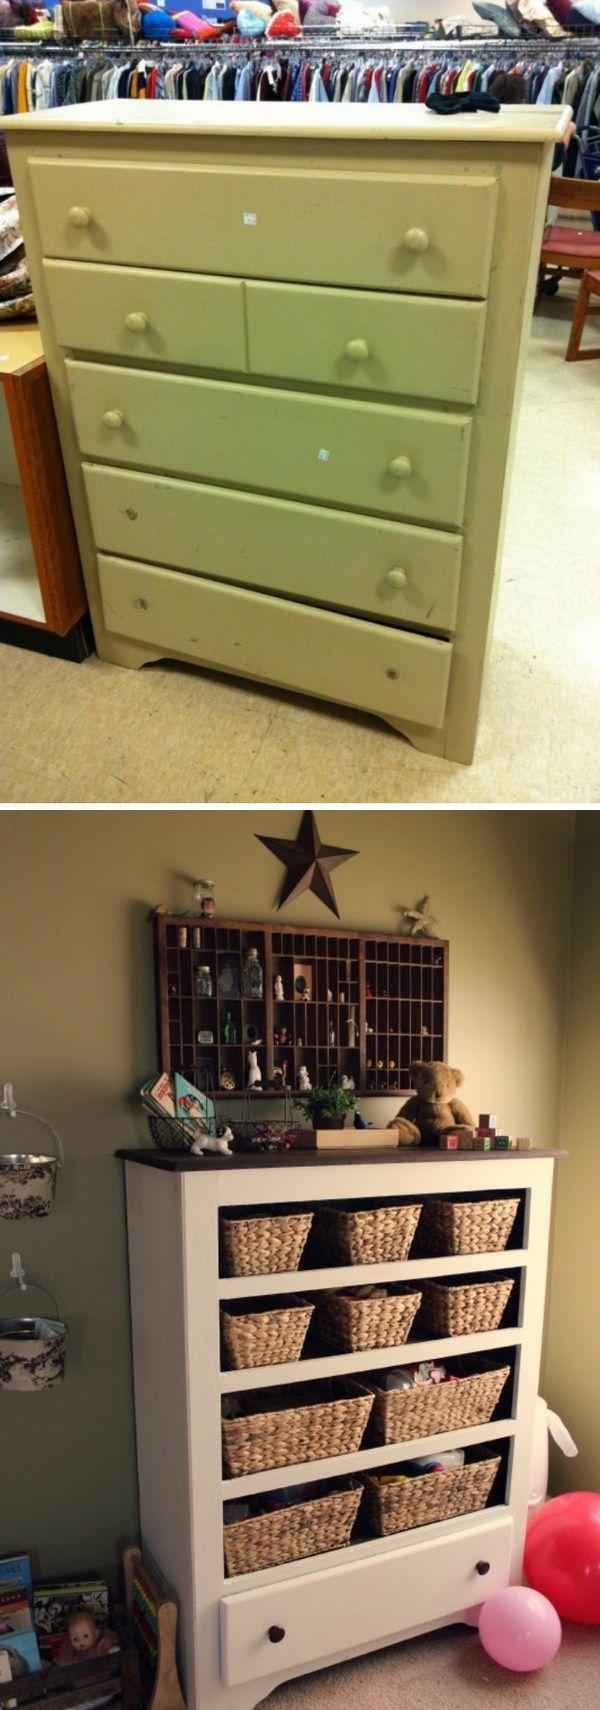 DIY Ideas Of Reusing Old Furniture 8